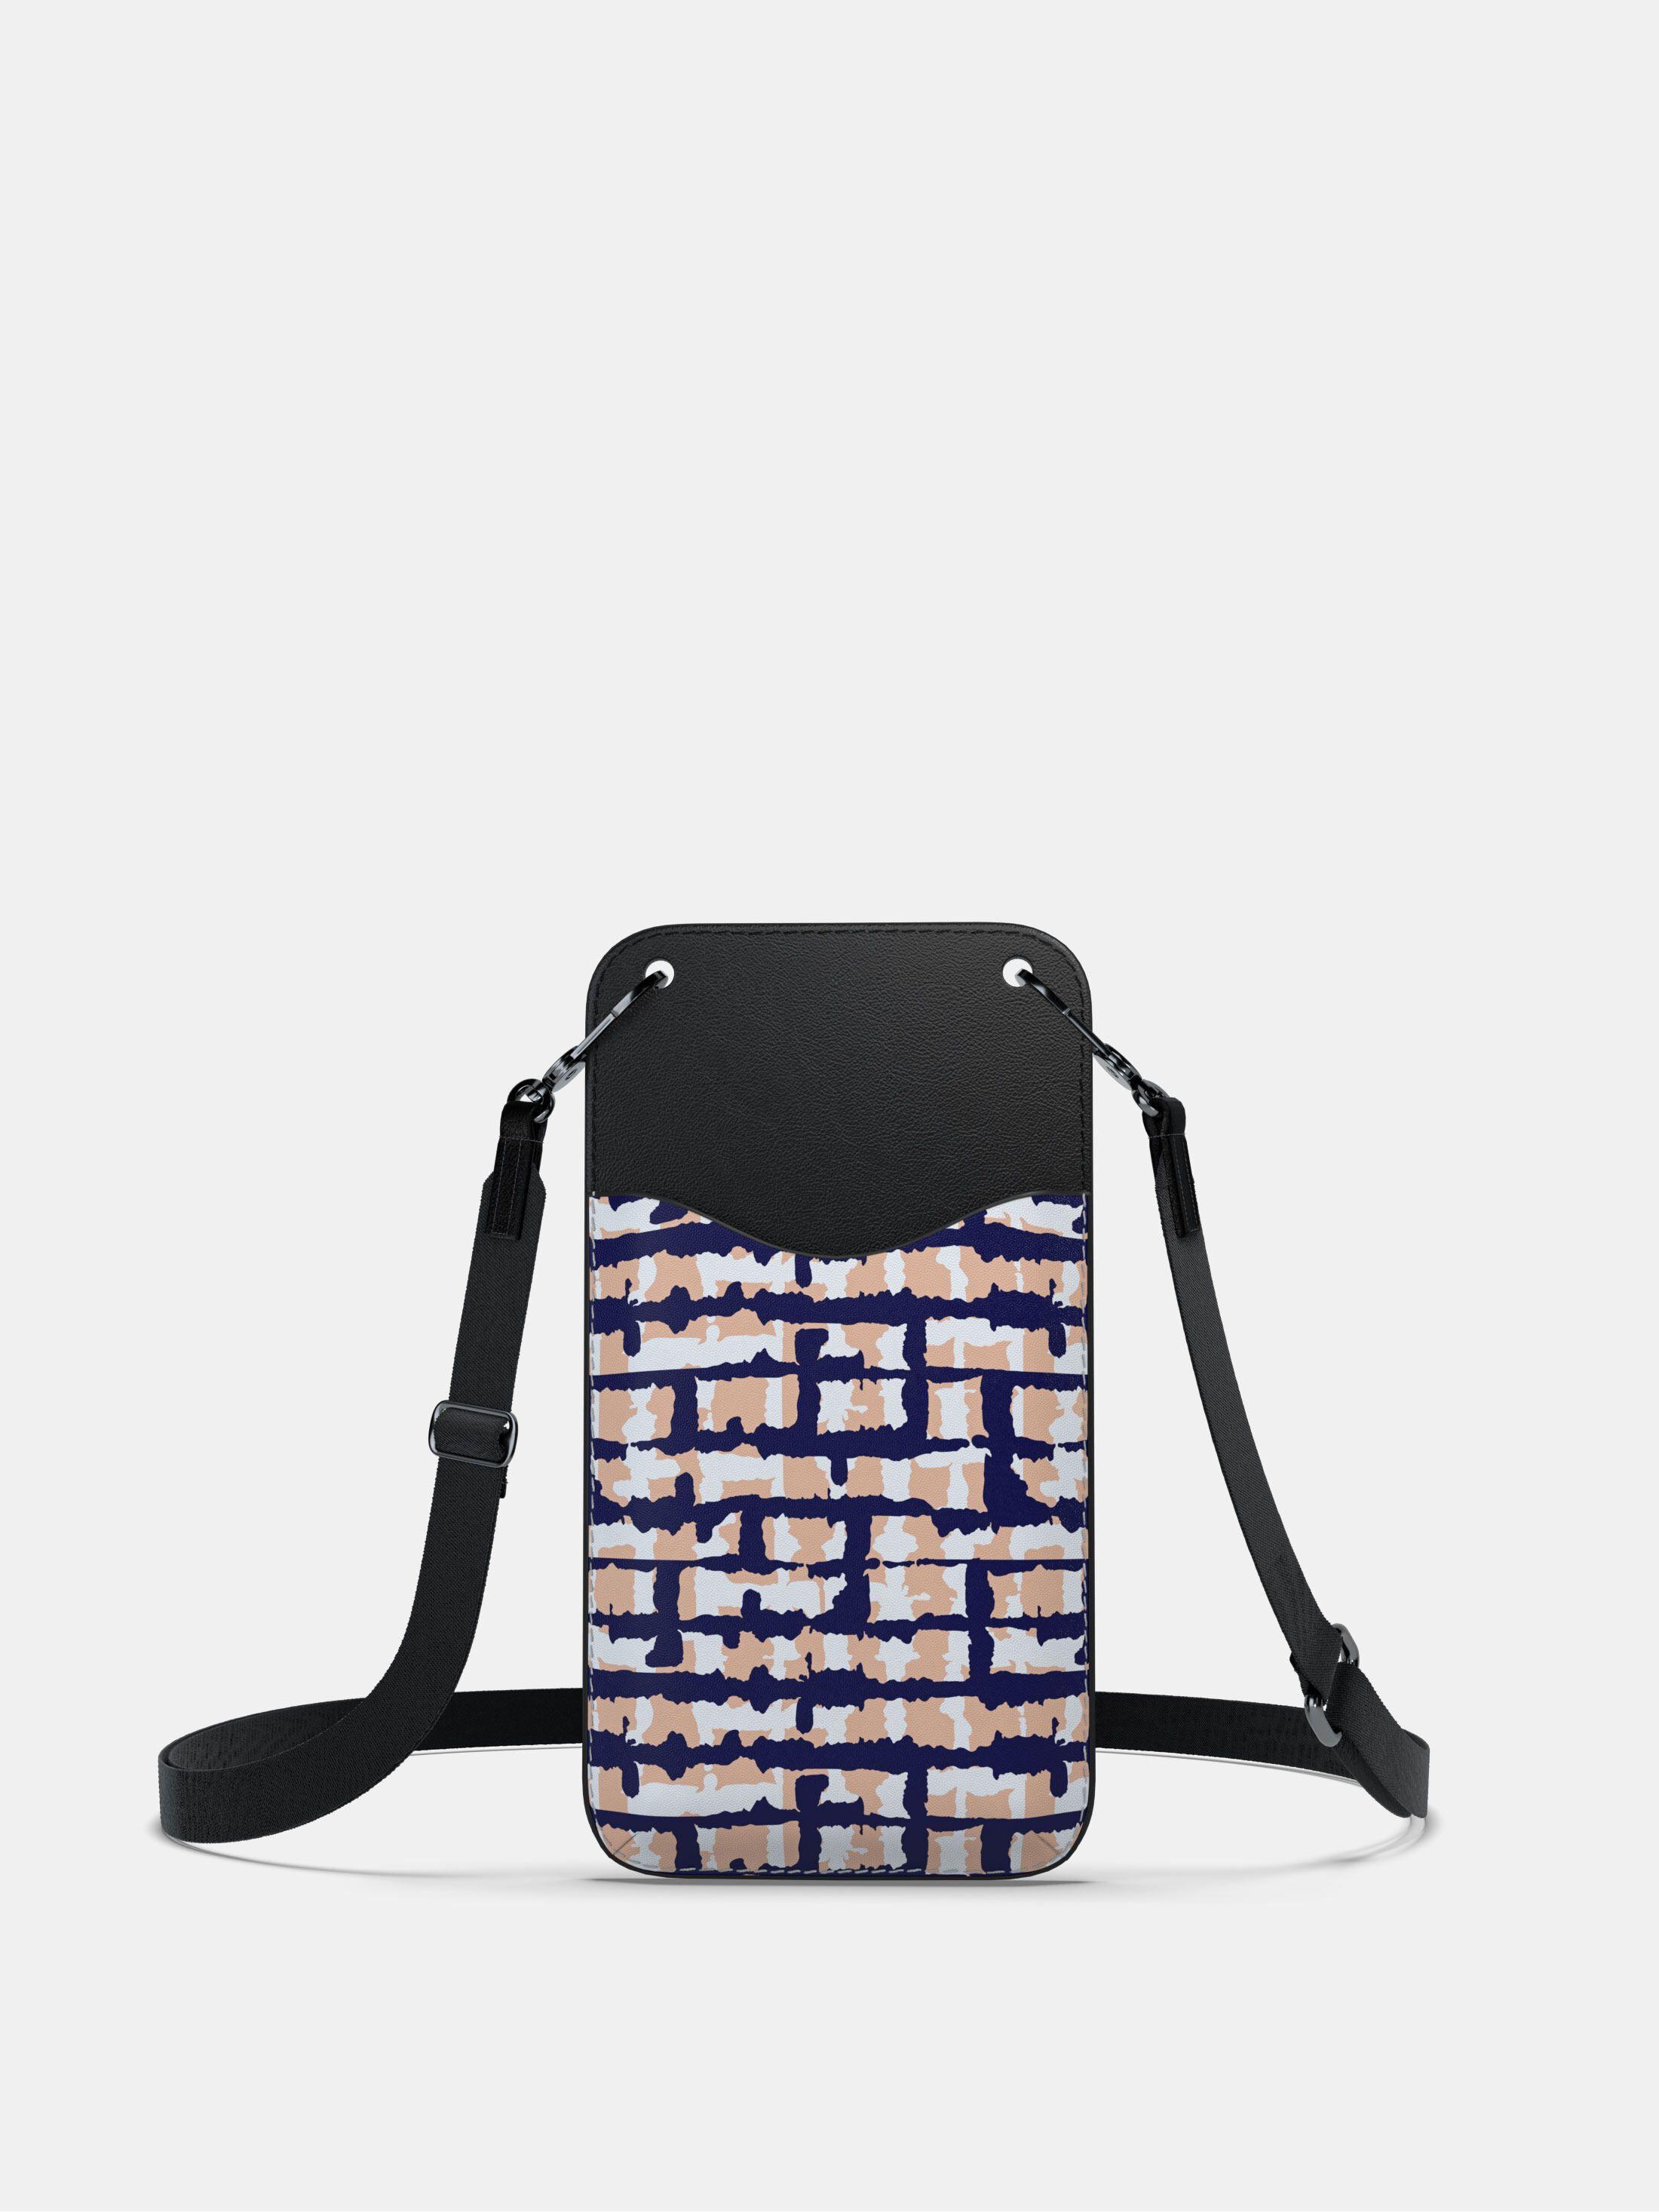 design you own phone holder uk